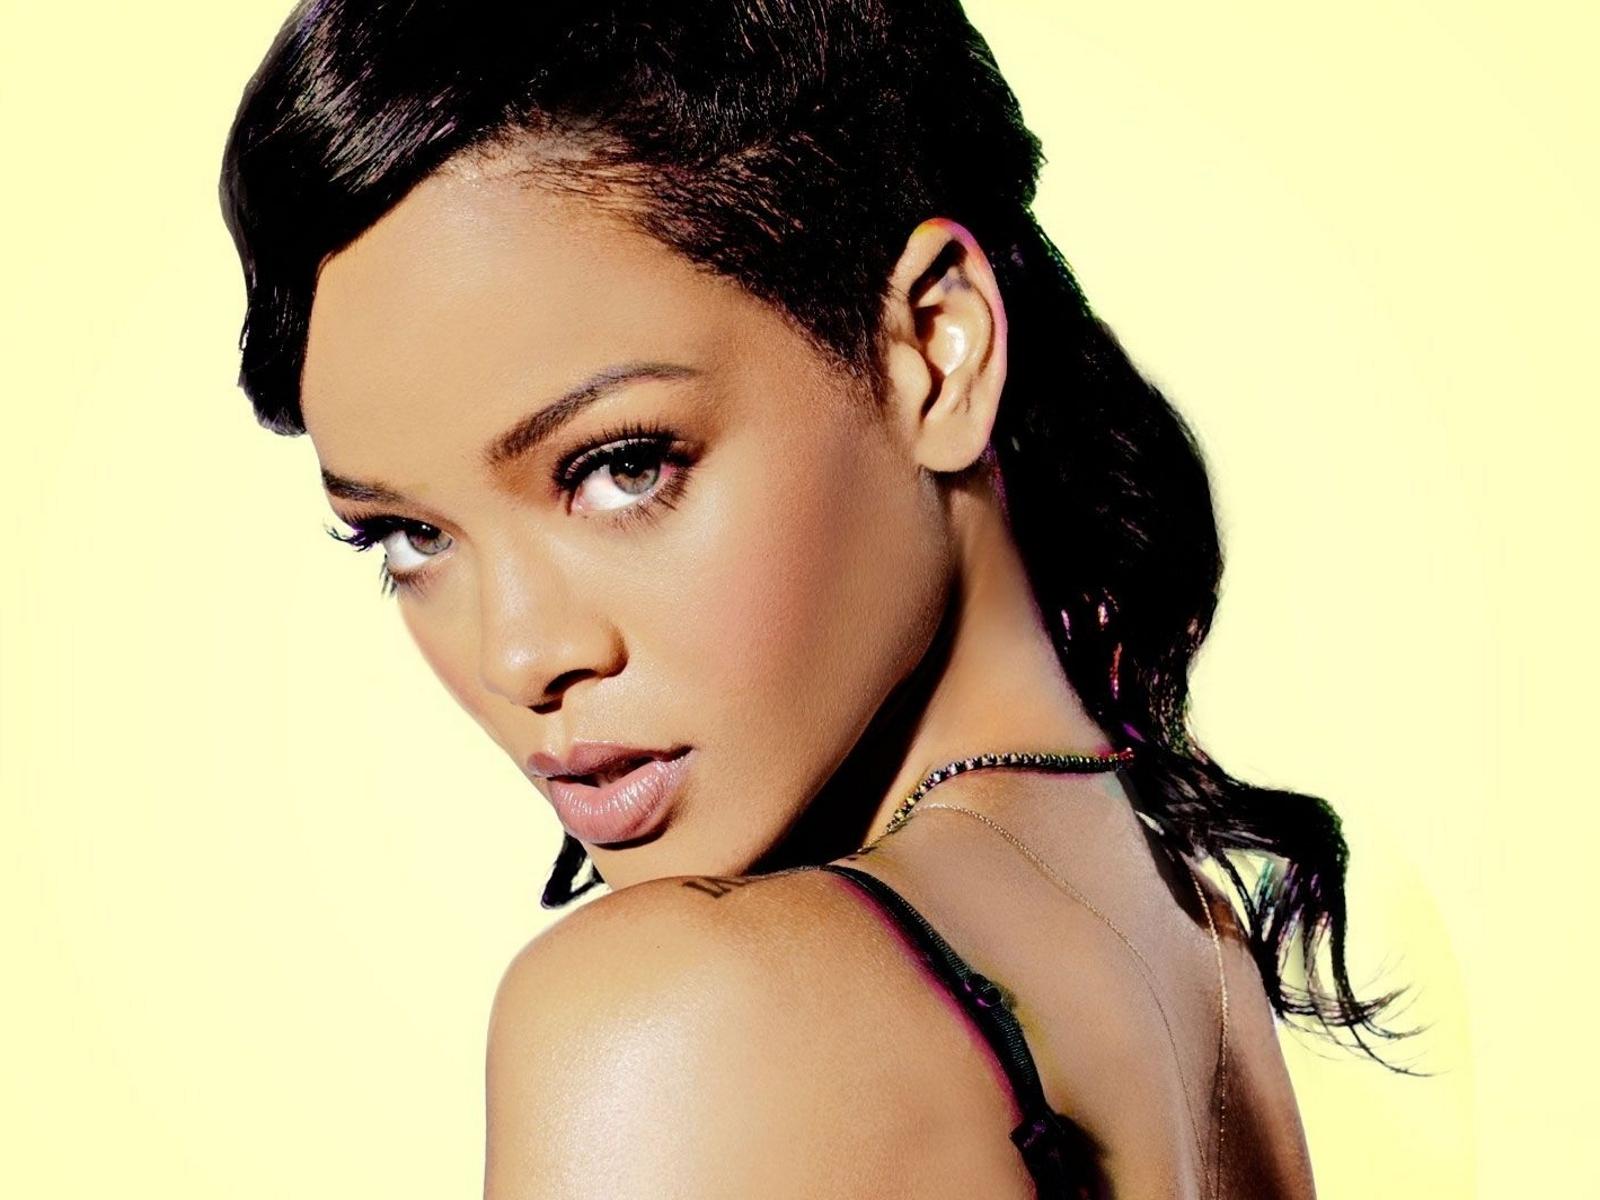 http://1.bp.blogspot.com/-FLMxCpQjerk/URkQ7ZLUv_I/AAAAAAAAjrM/j8HWAetFYH8/s1600/Rihanna-SNL-rihanna.jpg